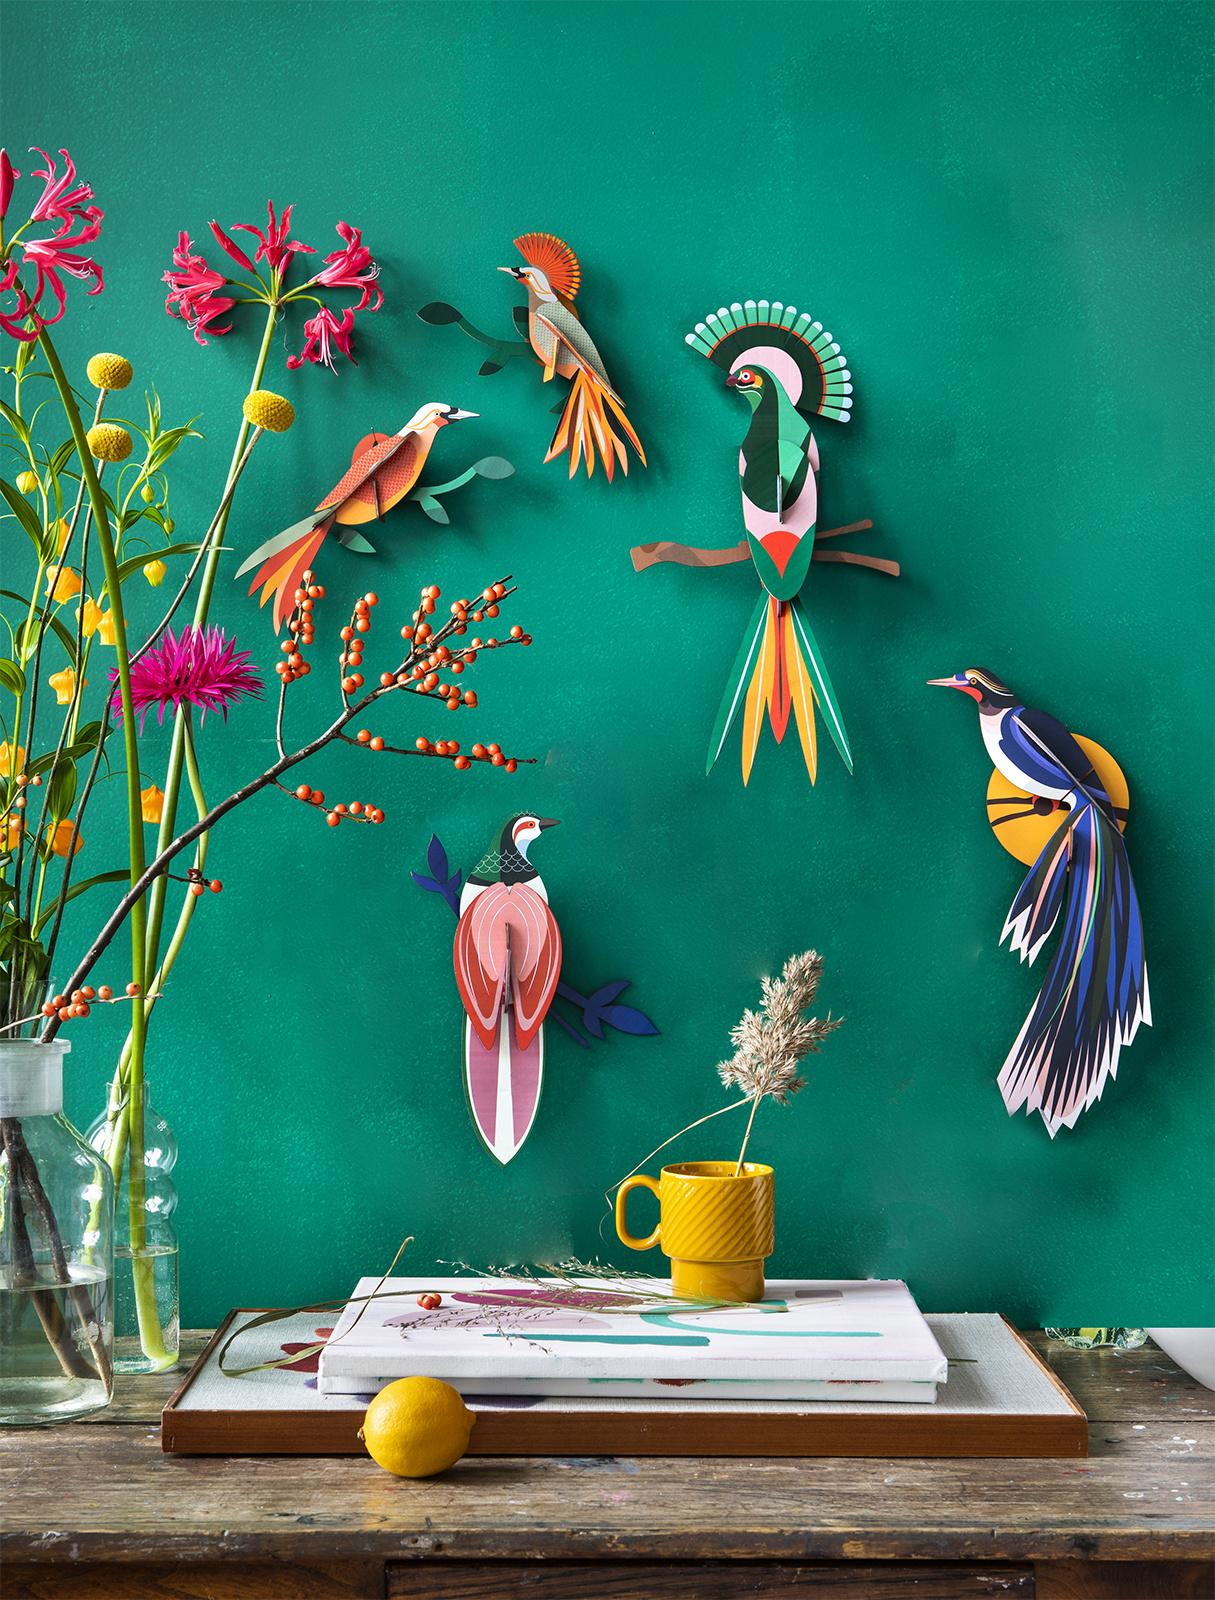 Studio Roof 3D Wanddekoration Paradise Bird Rani